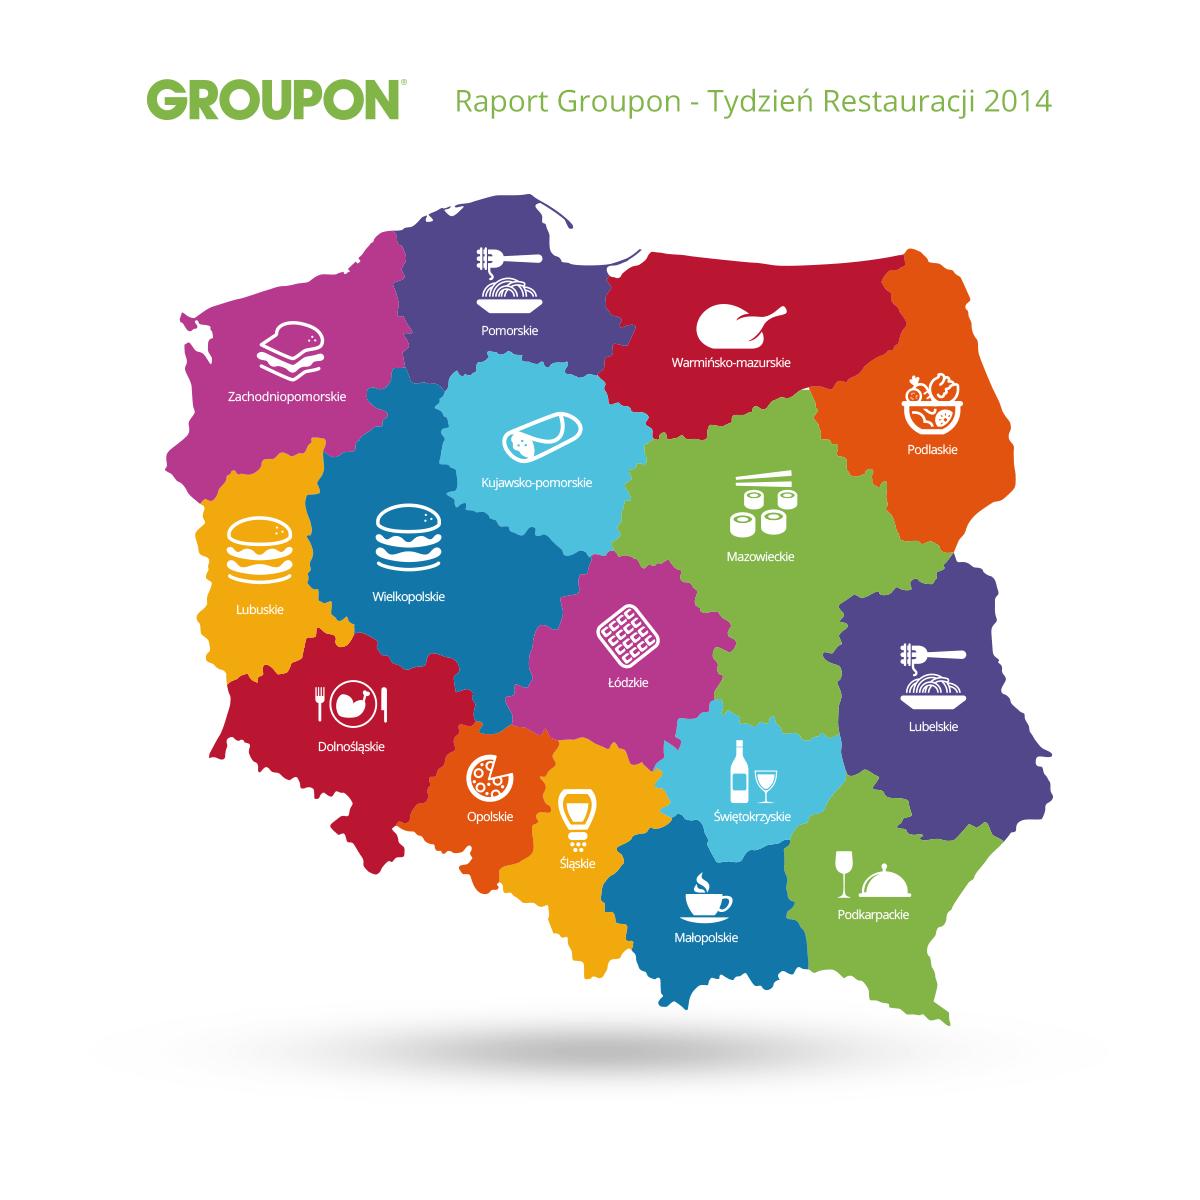 groupon-tydzien-restauracji-2014-raport